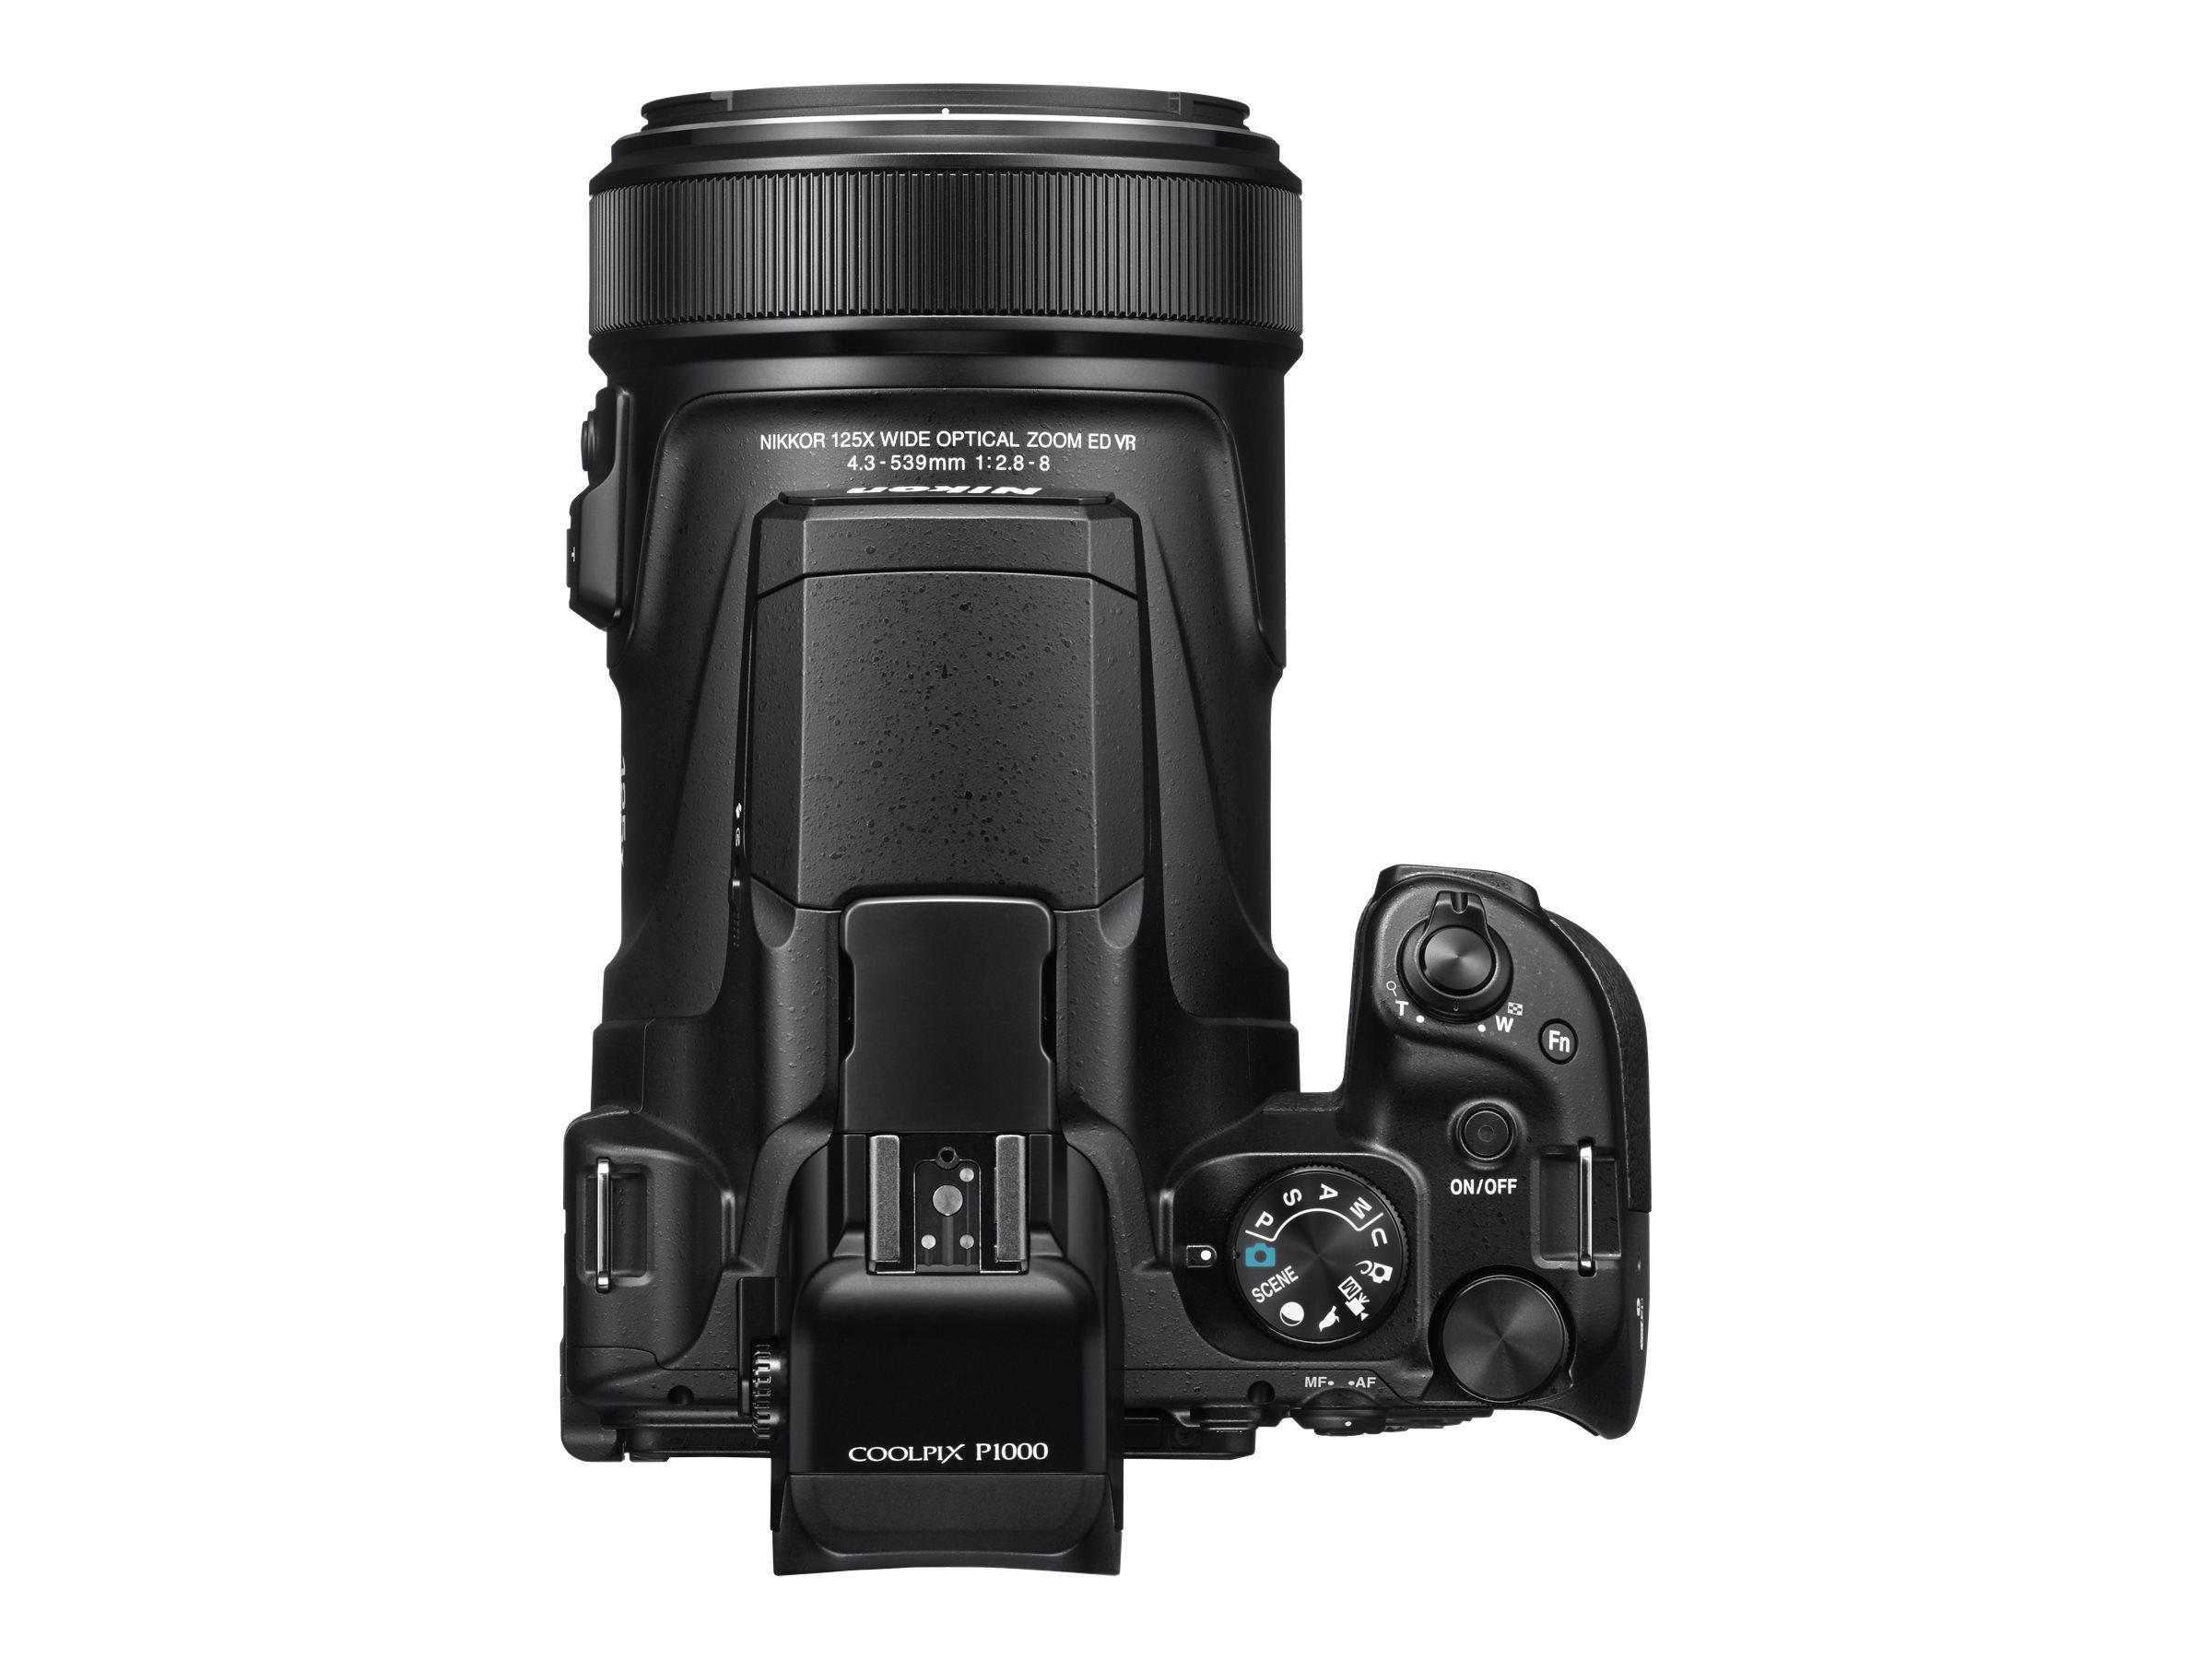 buy popular 29be9 6ca04 Nikon Coolpix P1000 Super Zoom Svart - Ernstsonfoto AB